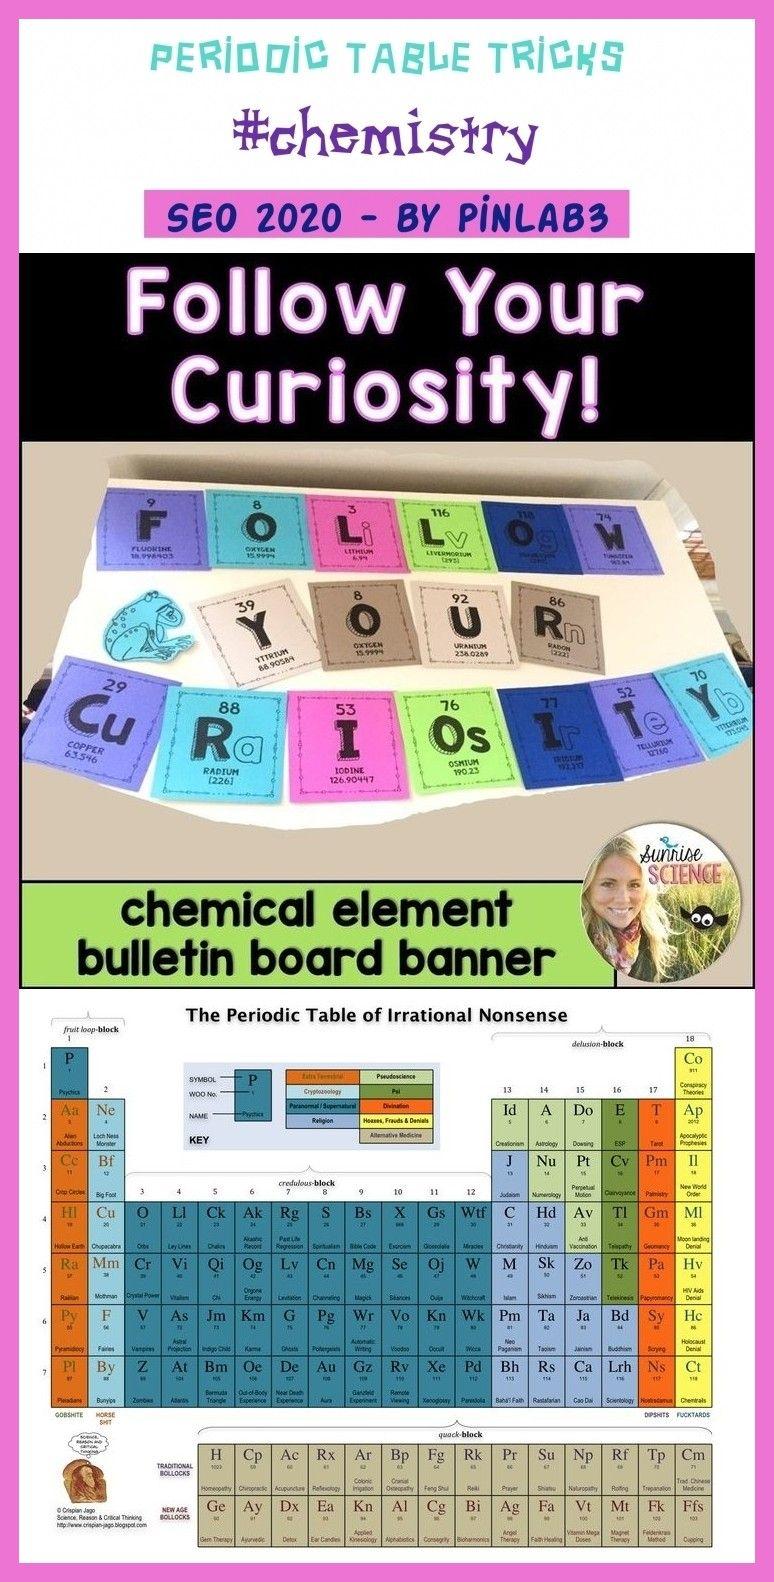 Periodic table tricks periodic table tricks